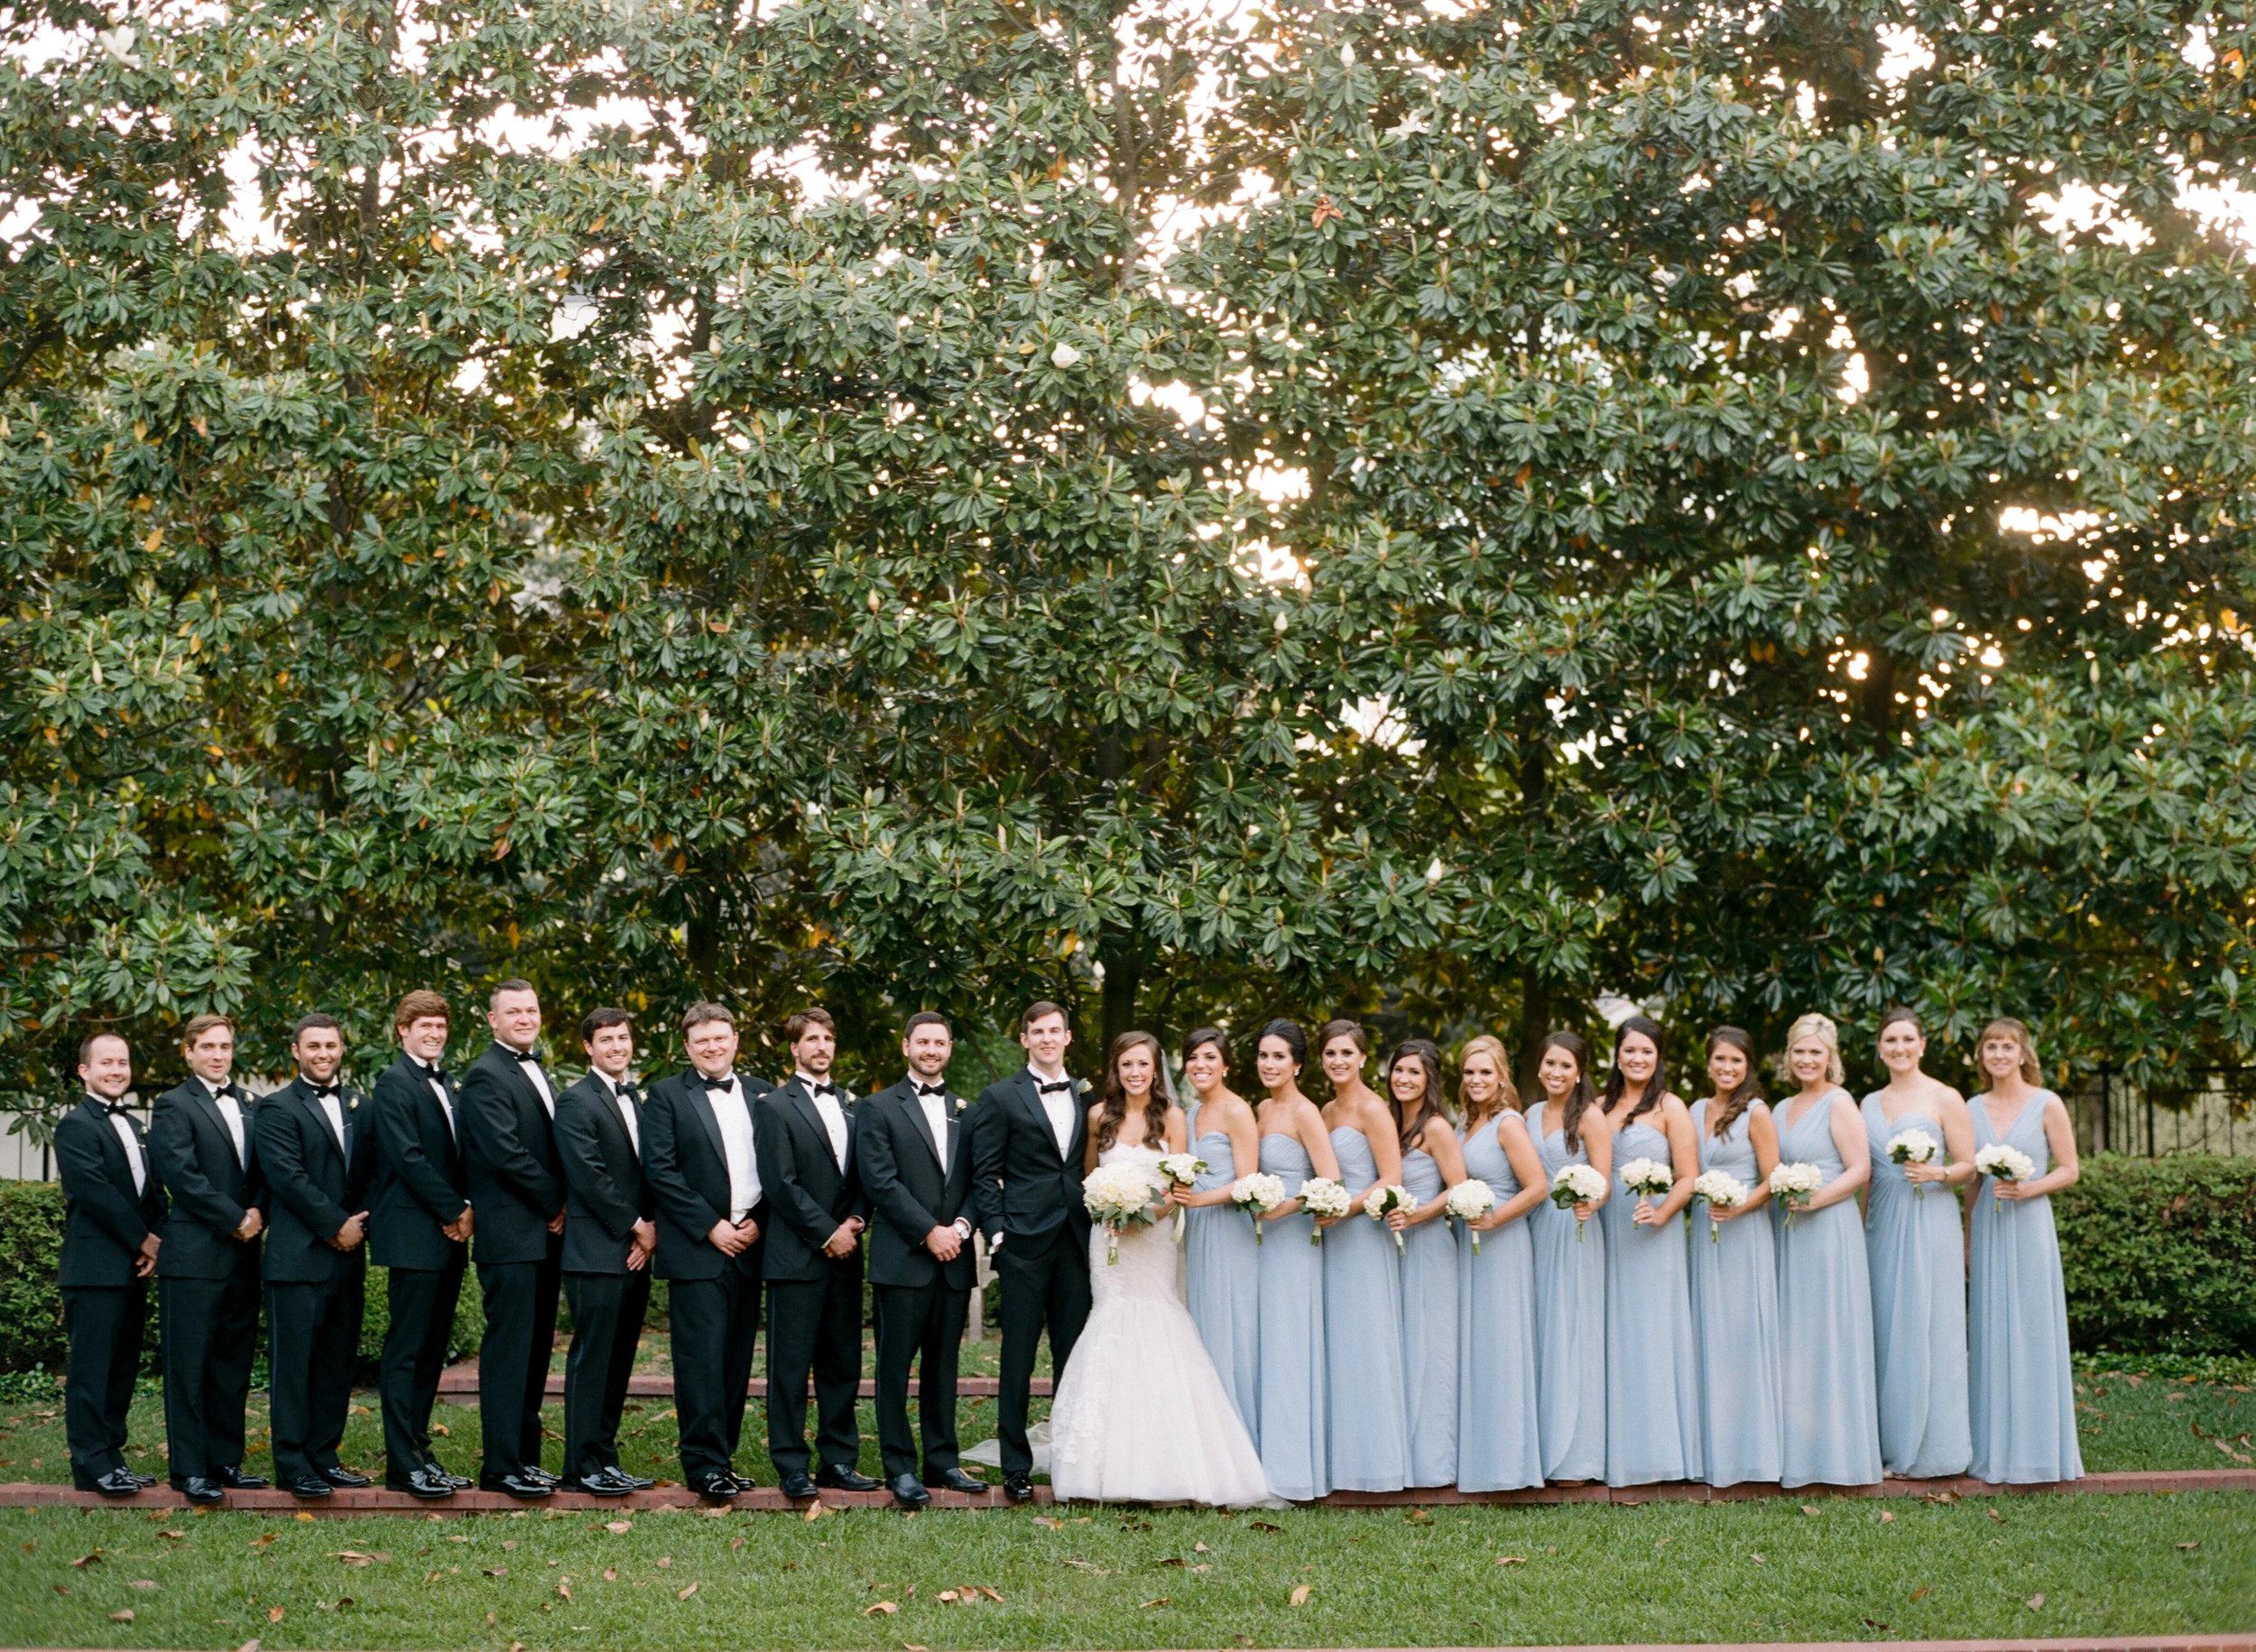 St.-Philip-Presbyterian-Church-Houston-Wedding-Ceremony-The-Junior-League-Of-Houston-Reception-Dana-Fernandez-Photography-Fine-Art-Film-16.jpg